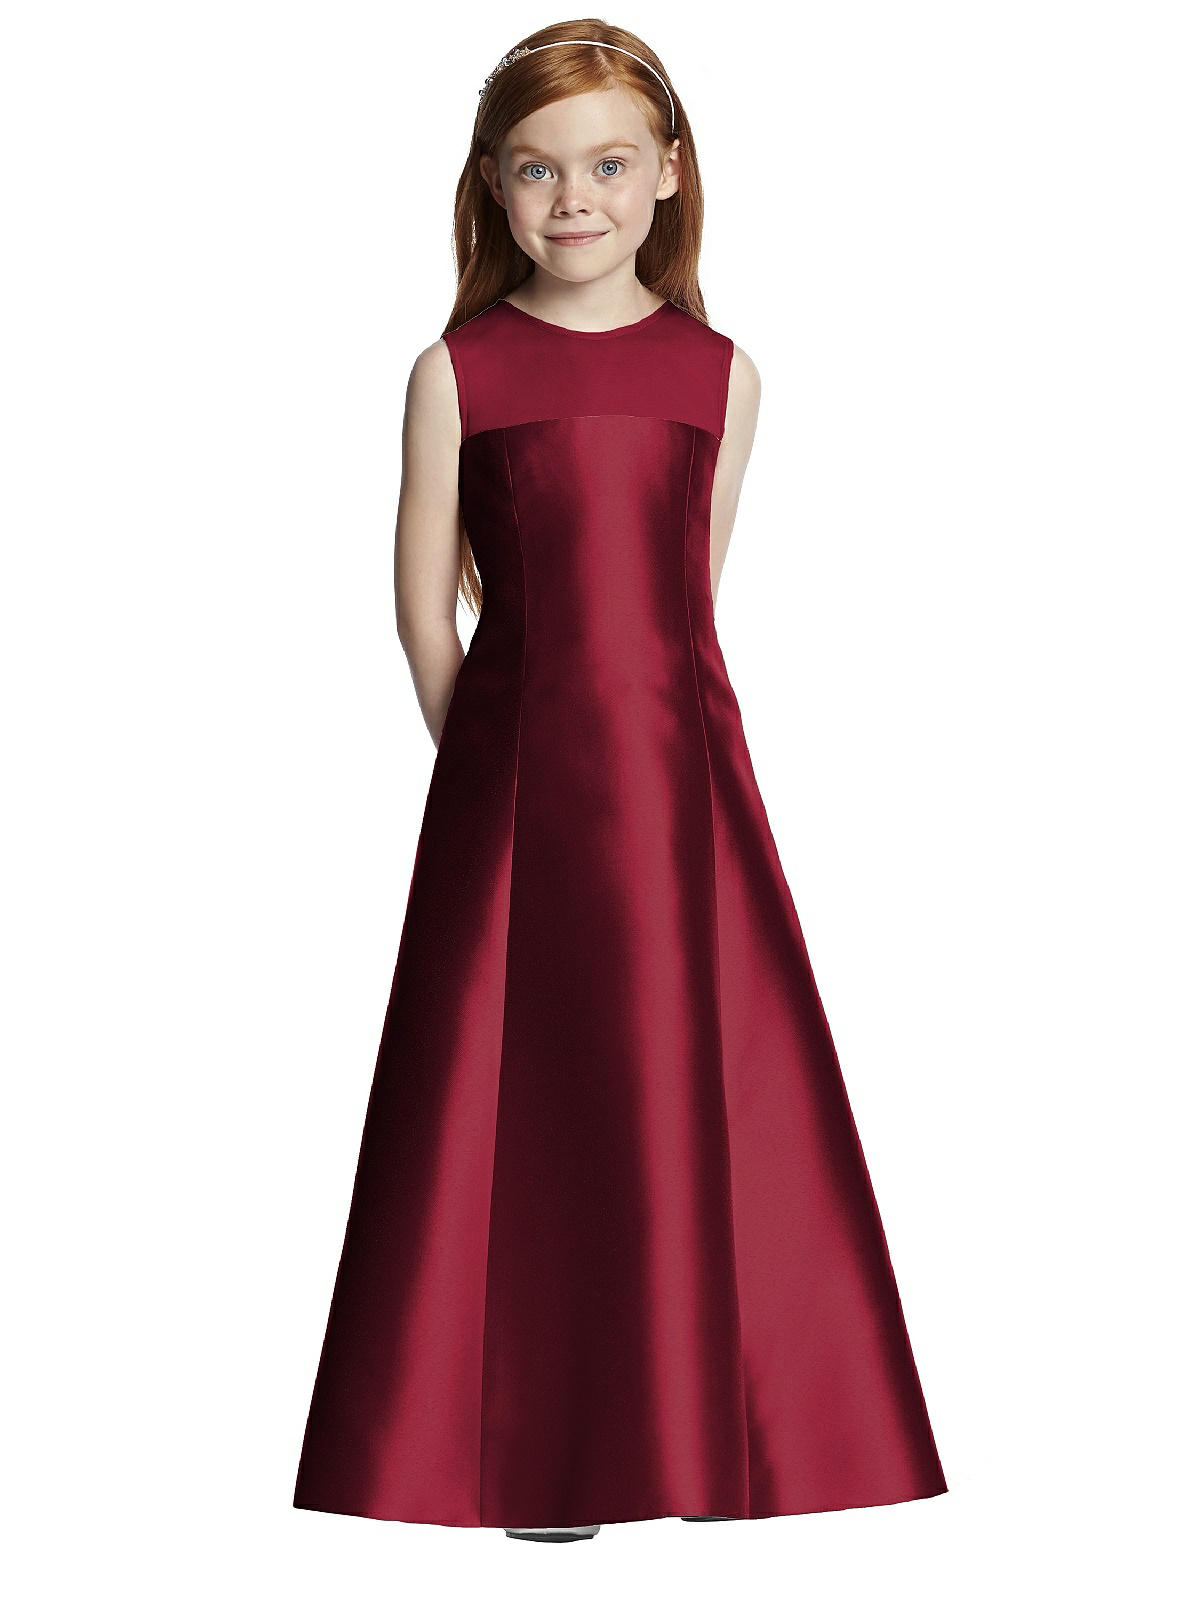 198c67ca100 Dessy Dresses Flower Girl - Gomes Weine AG